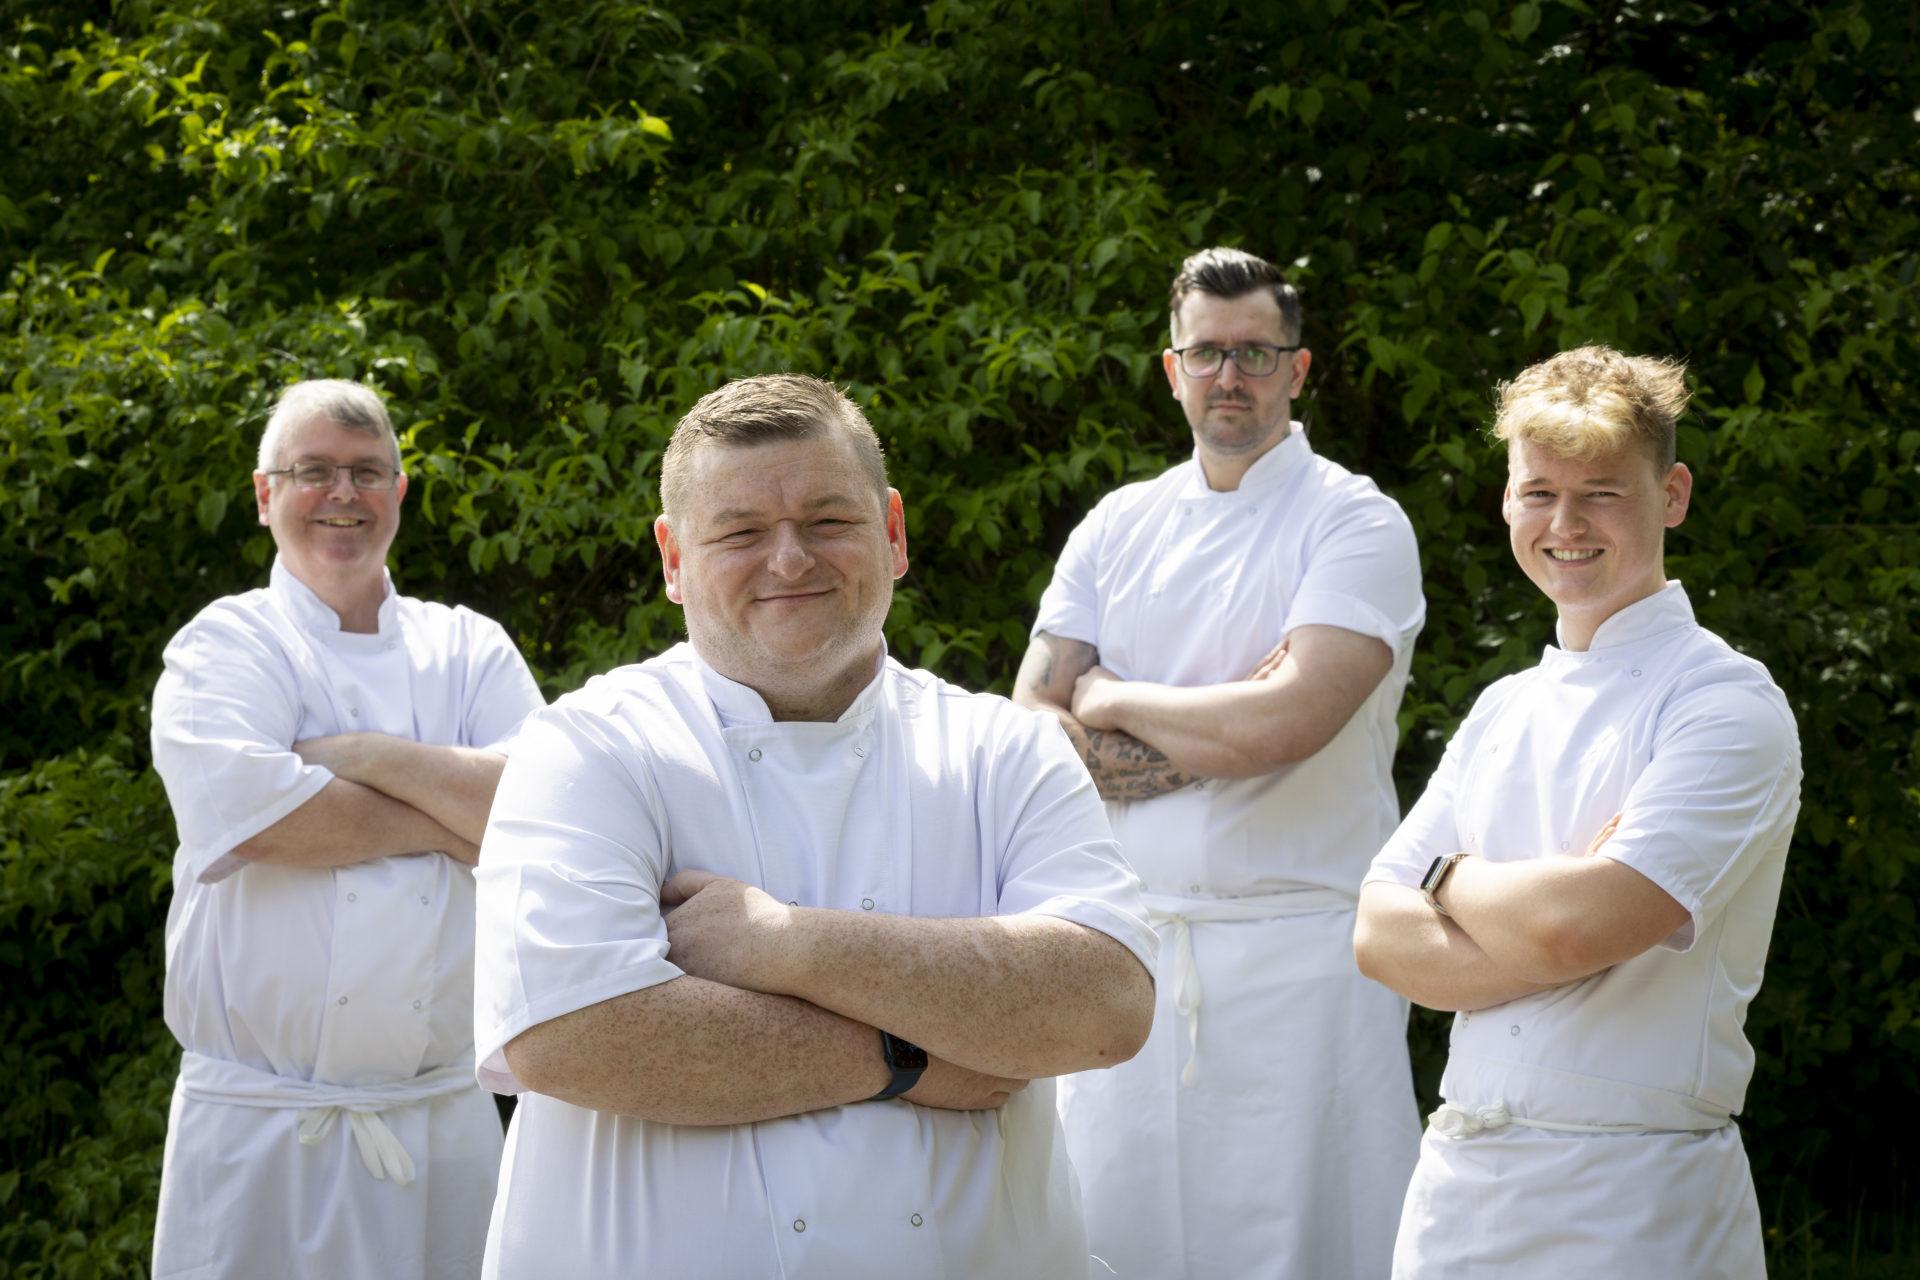 Chef Group Shot